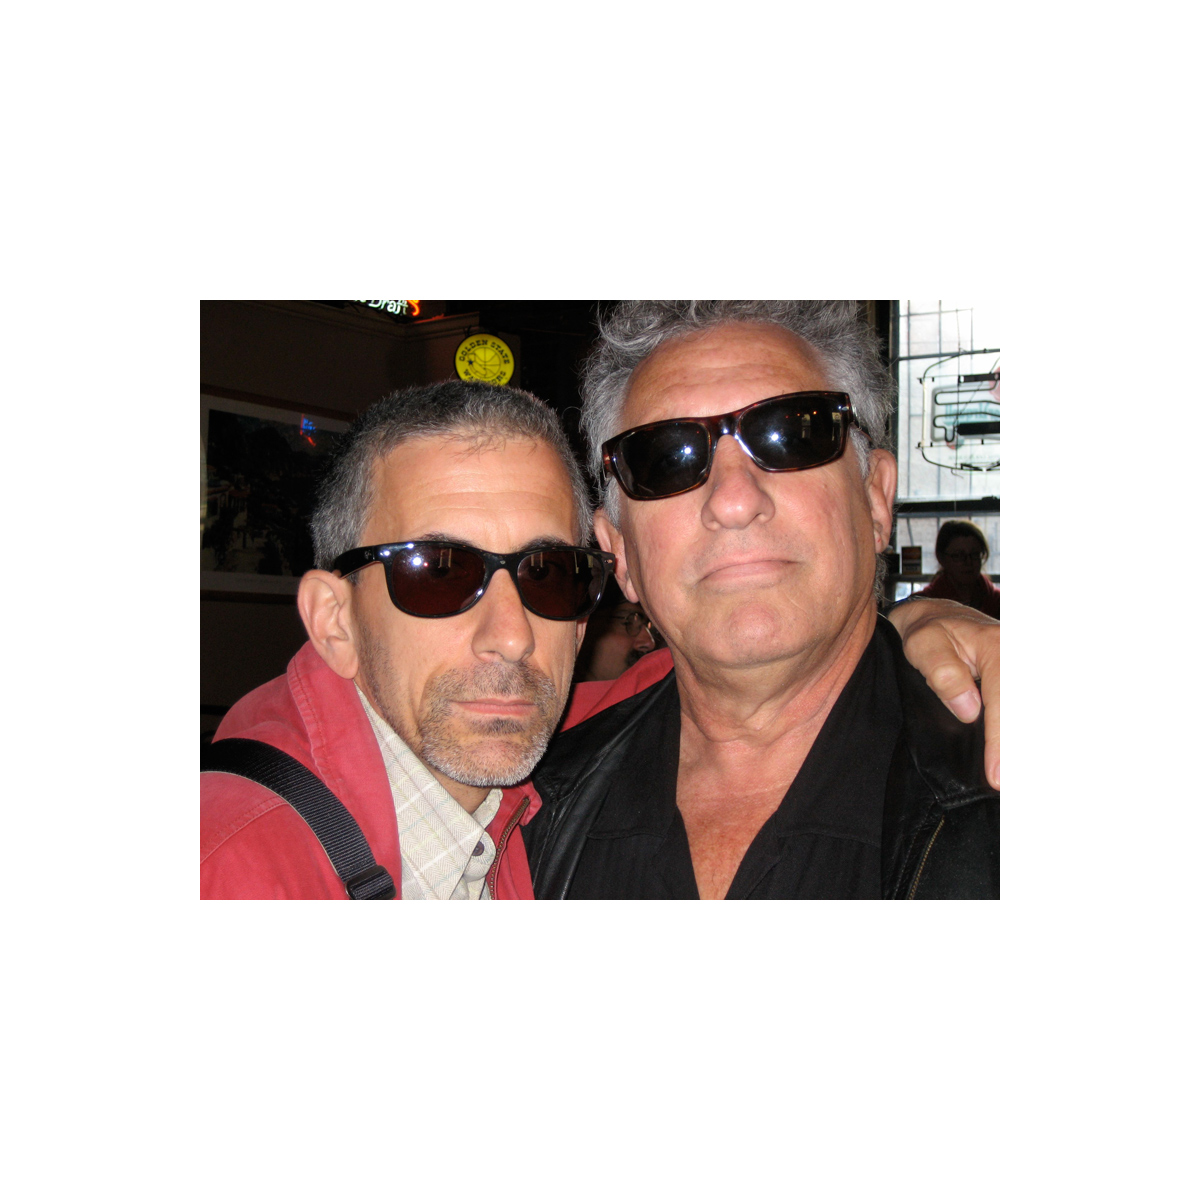 Ed & Brian ....'nuff said